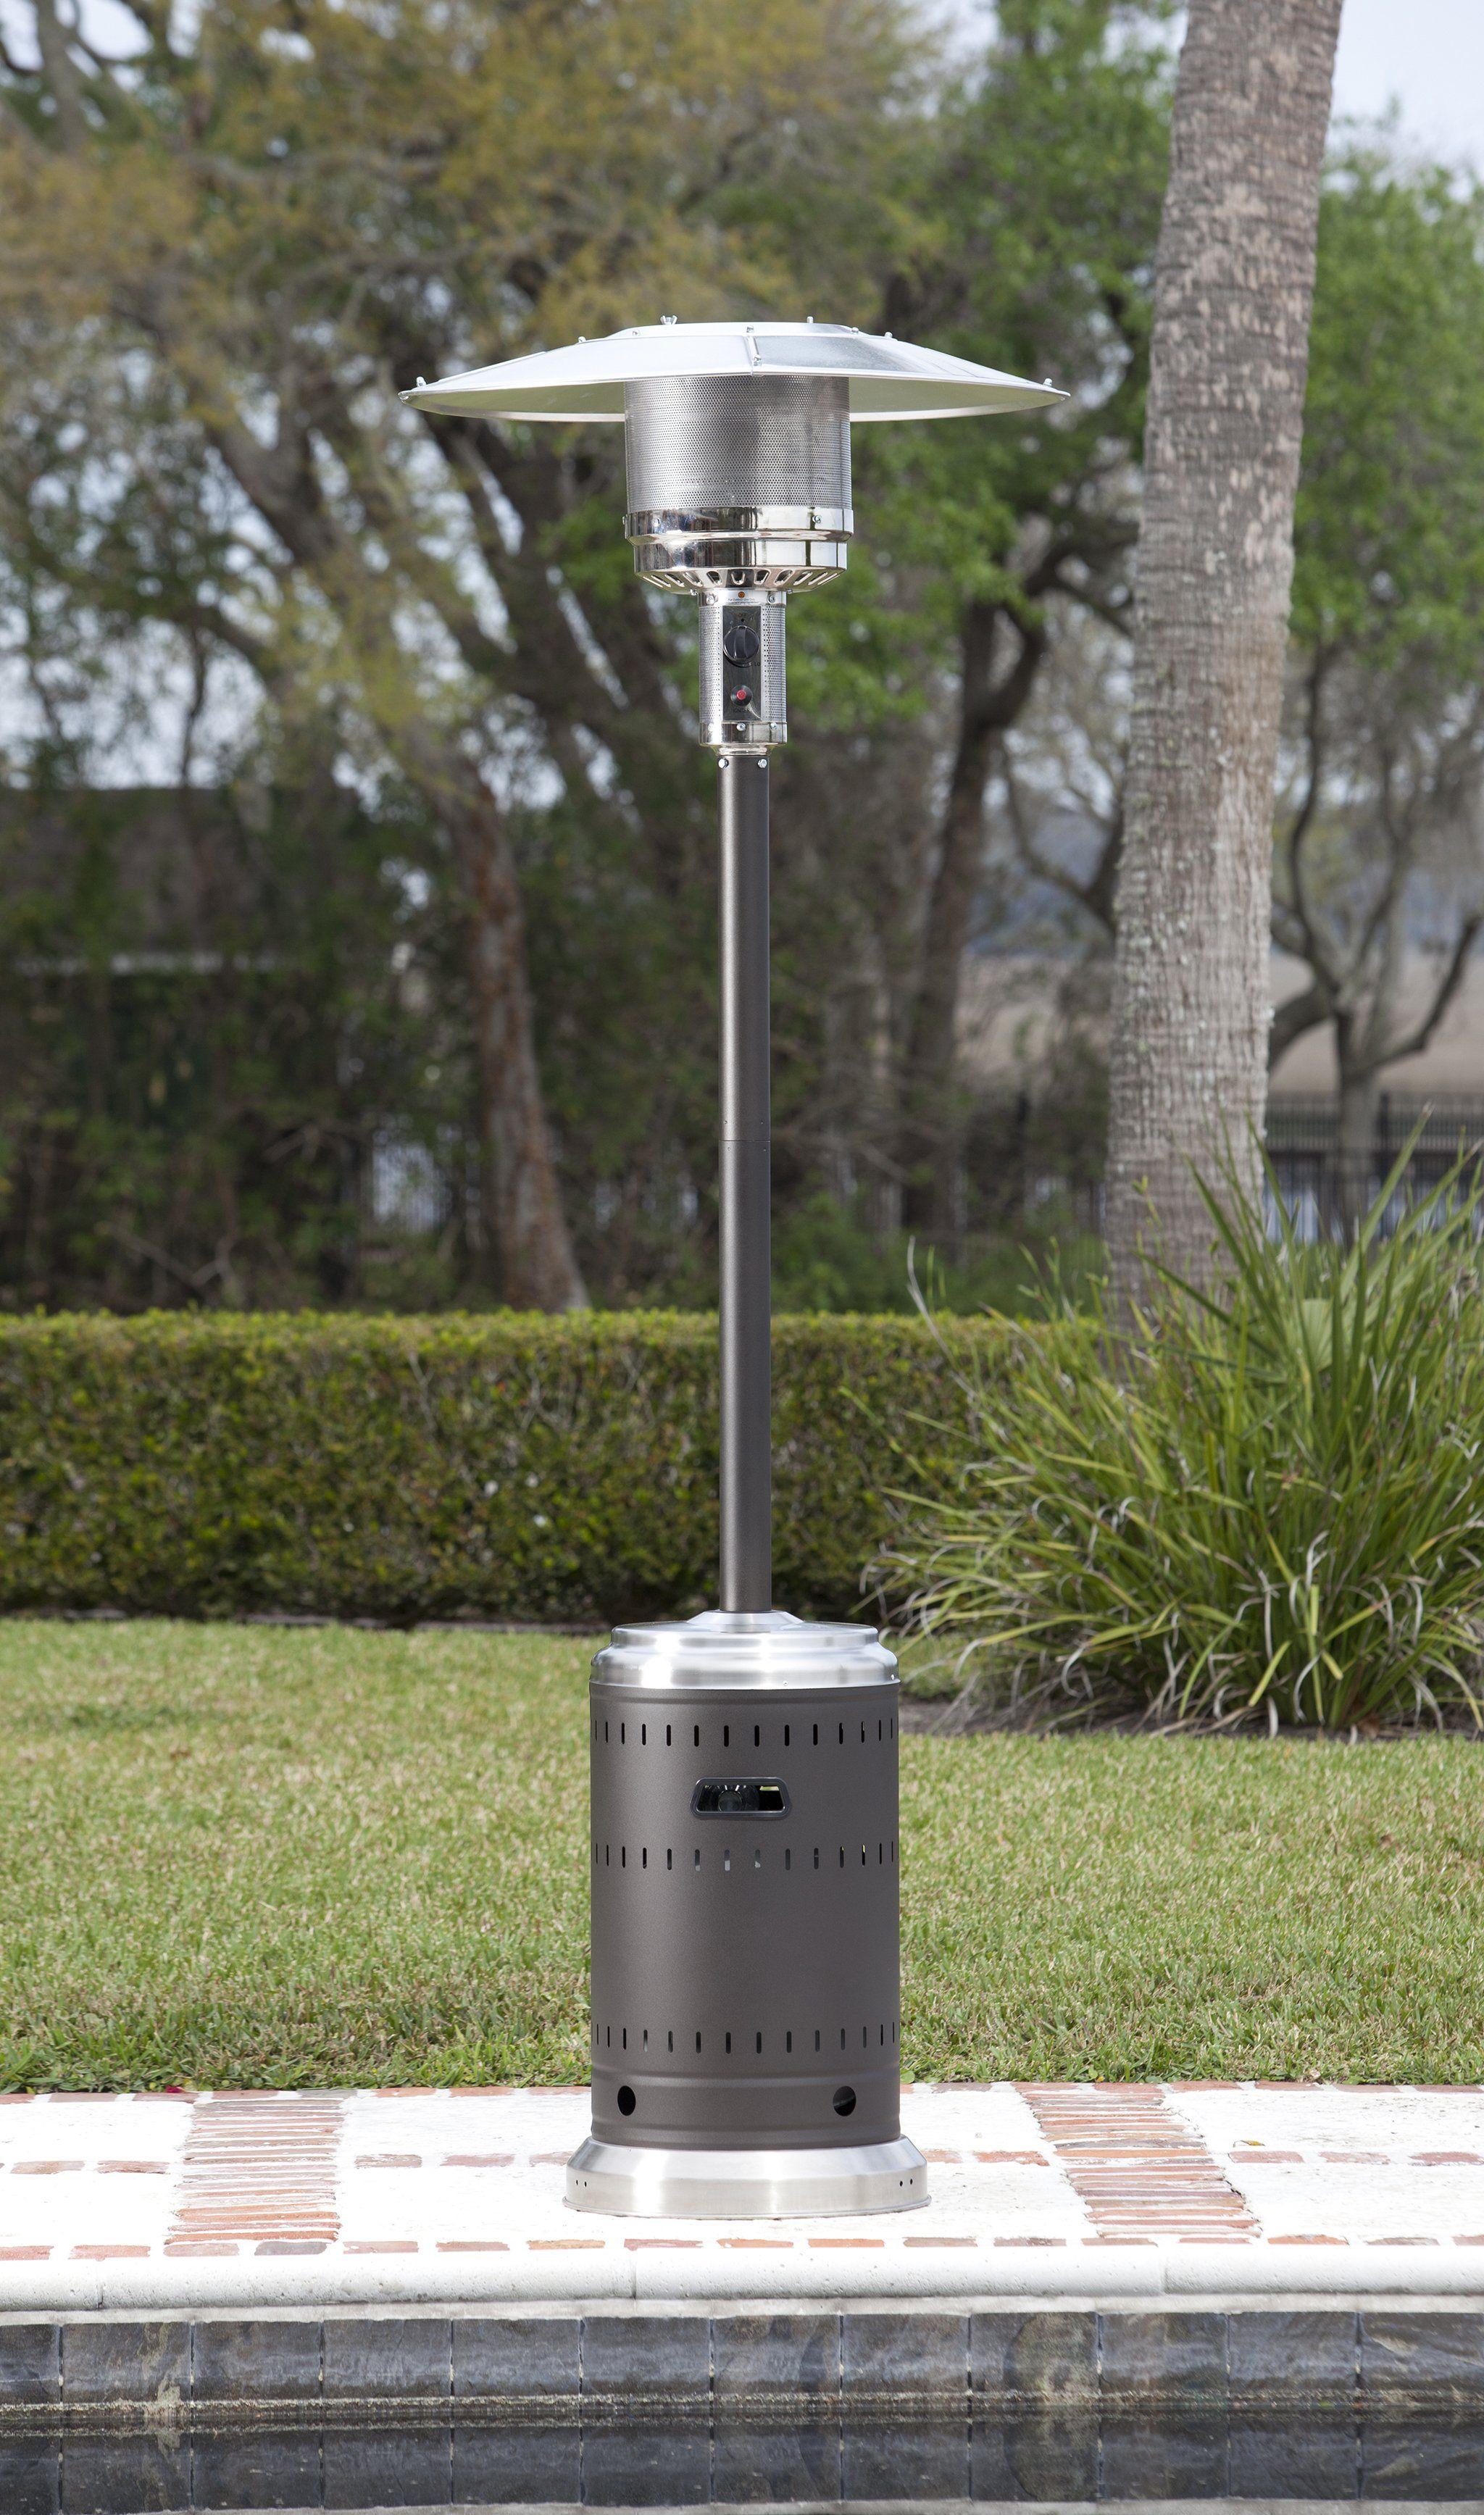 Mocha Stainless Steel Patio Heater Patio Heater Gas Patio